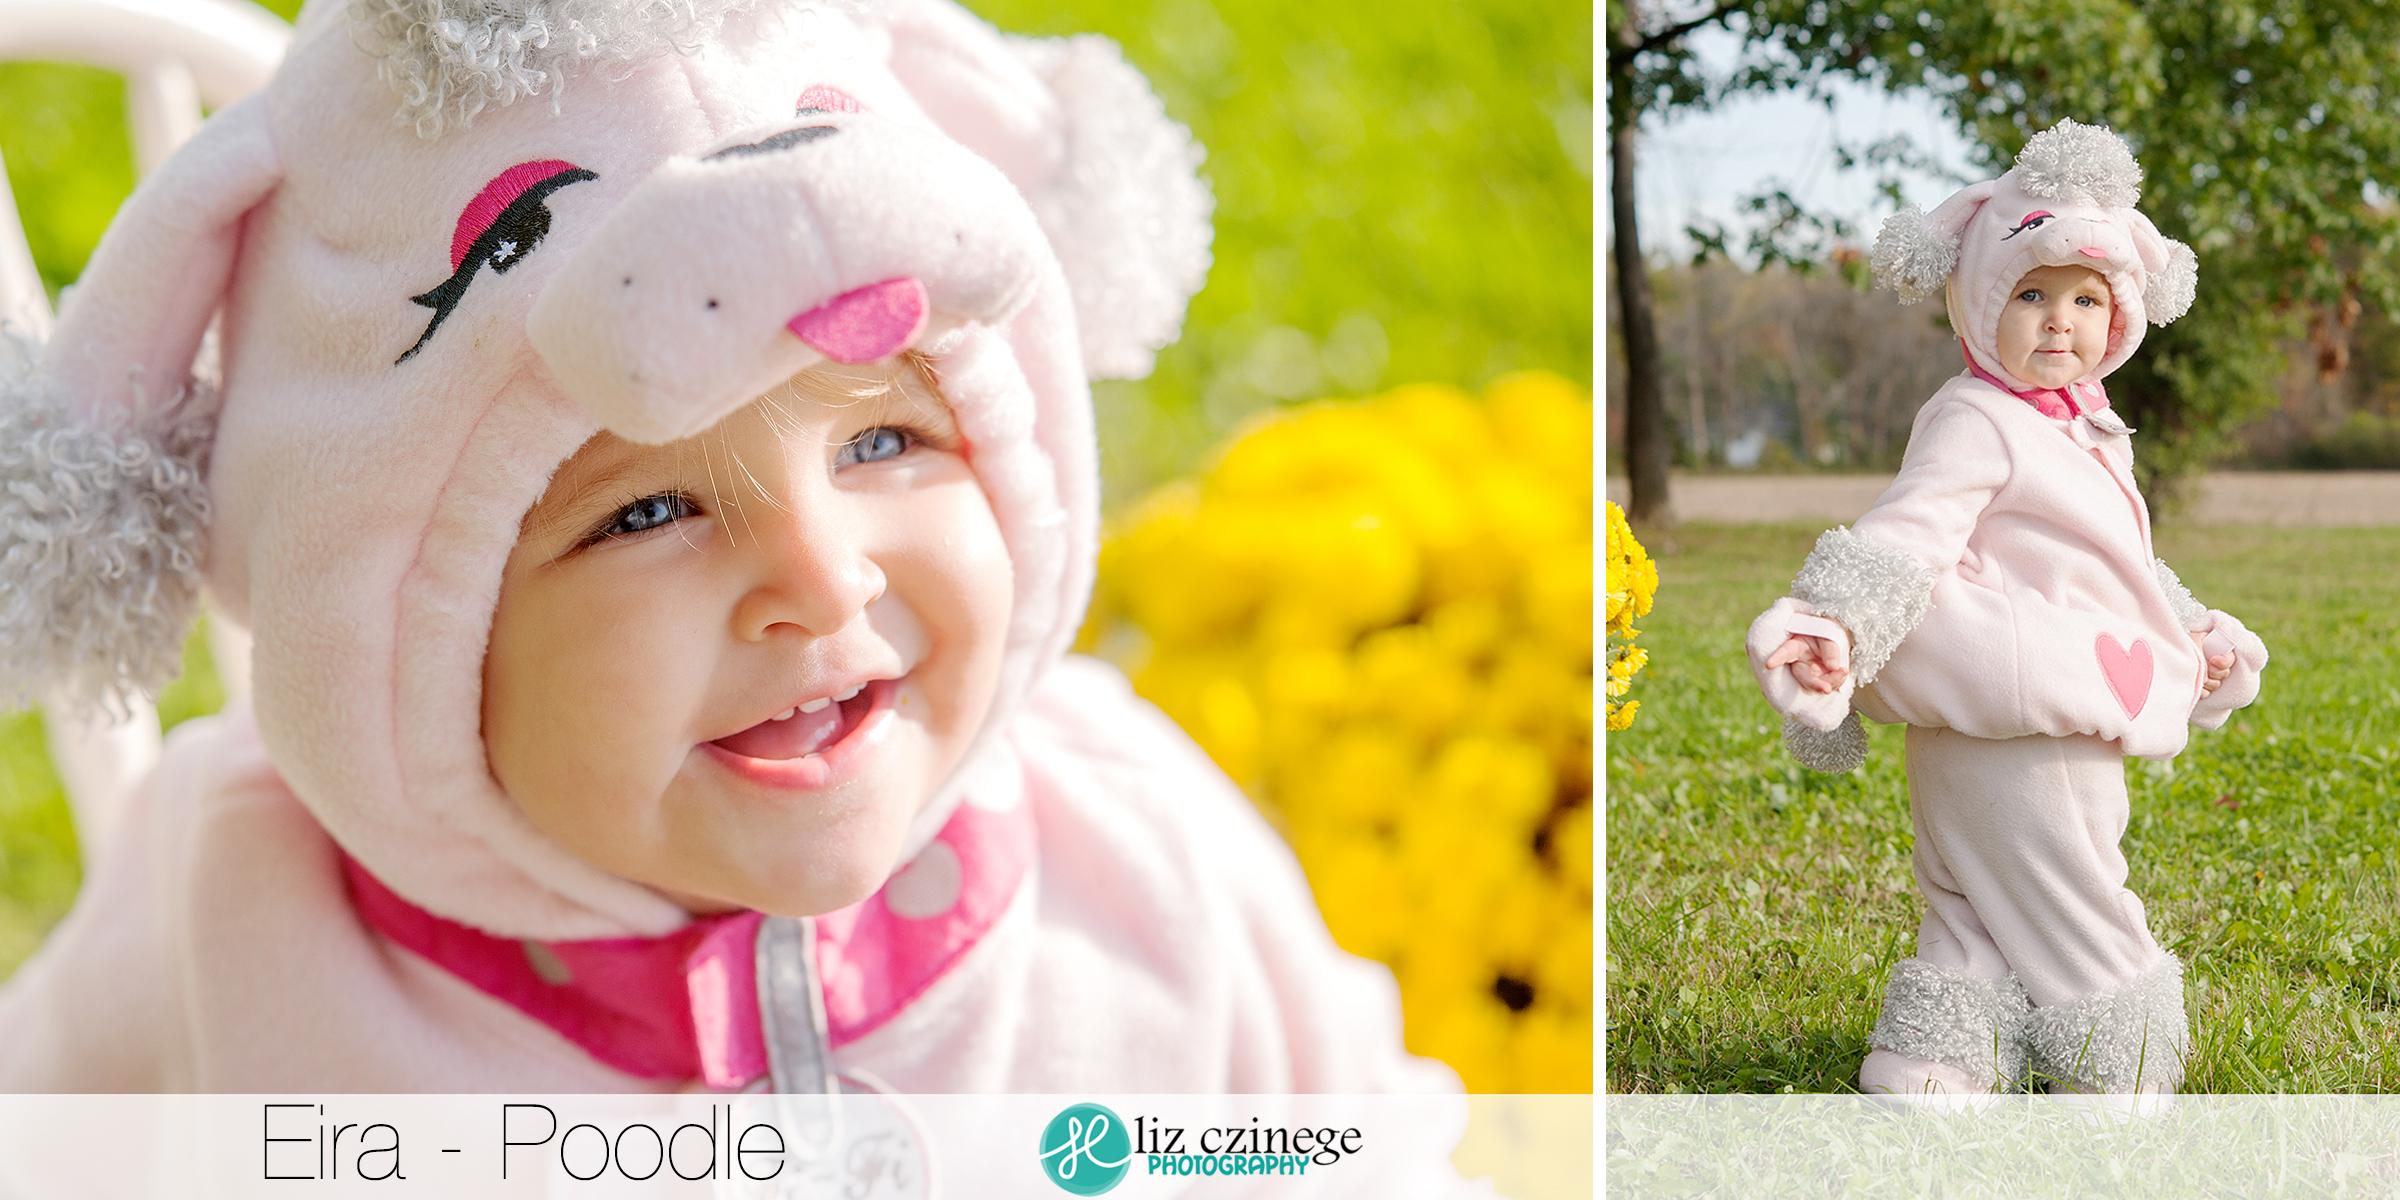 liz_czinege_child_photographer_niagara_hamilton07